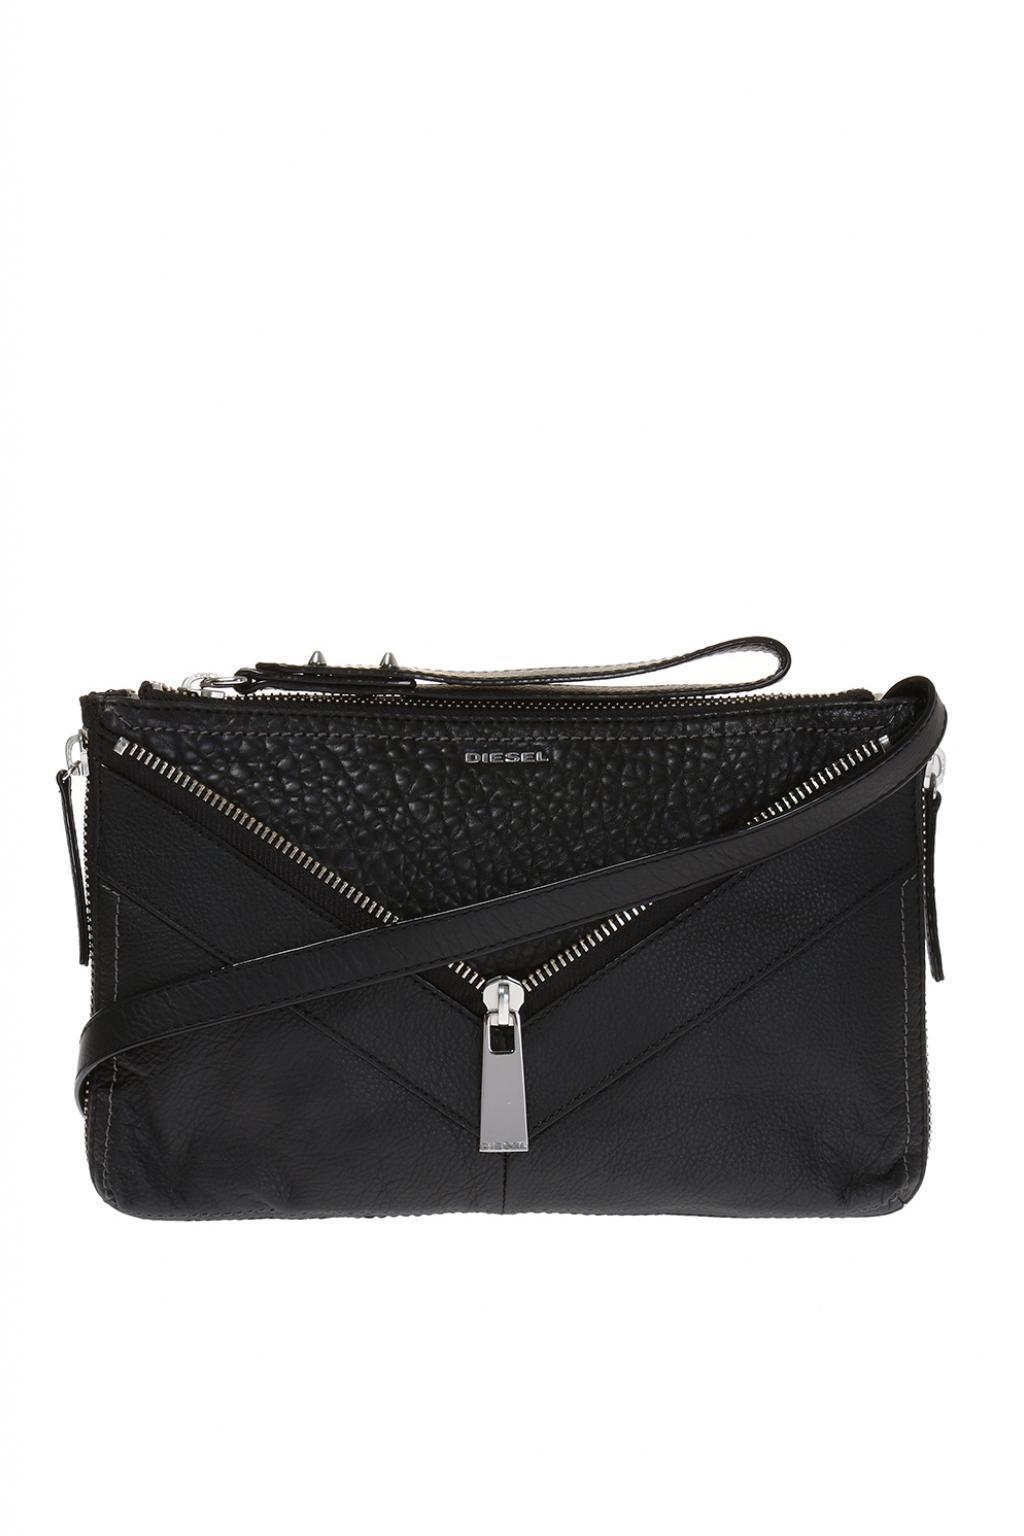 Womens le-zipper Le-ninna - Handbag Top-Handle Bag Black (Black) Diesel AQnITsn